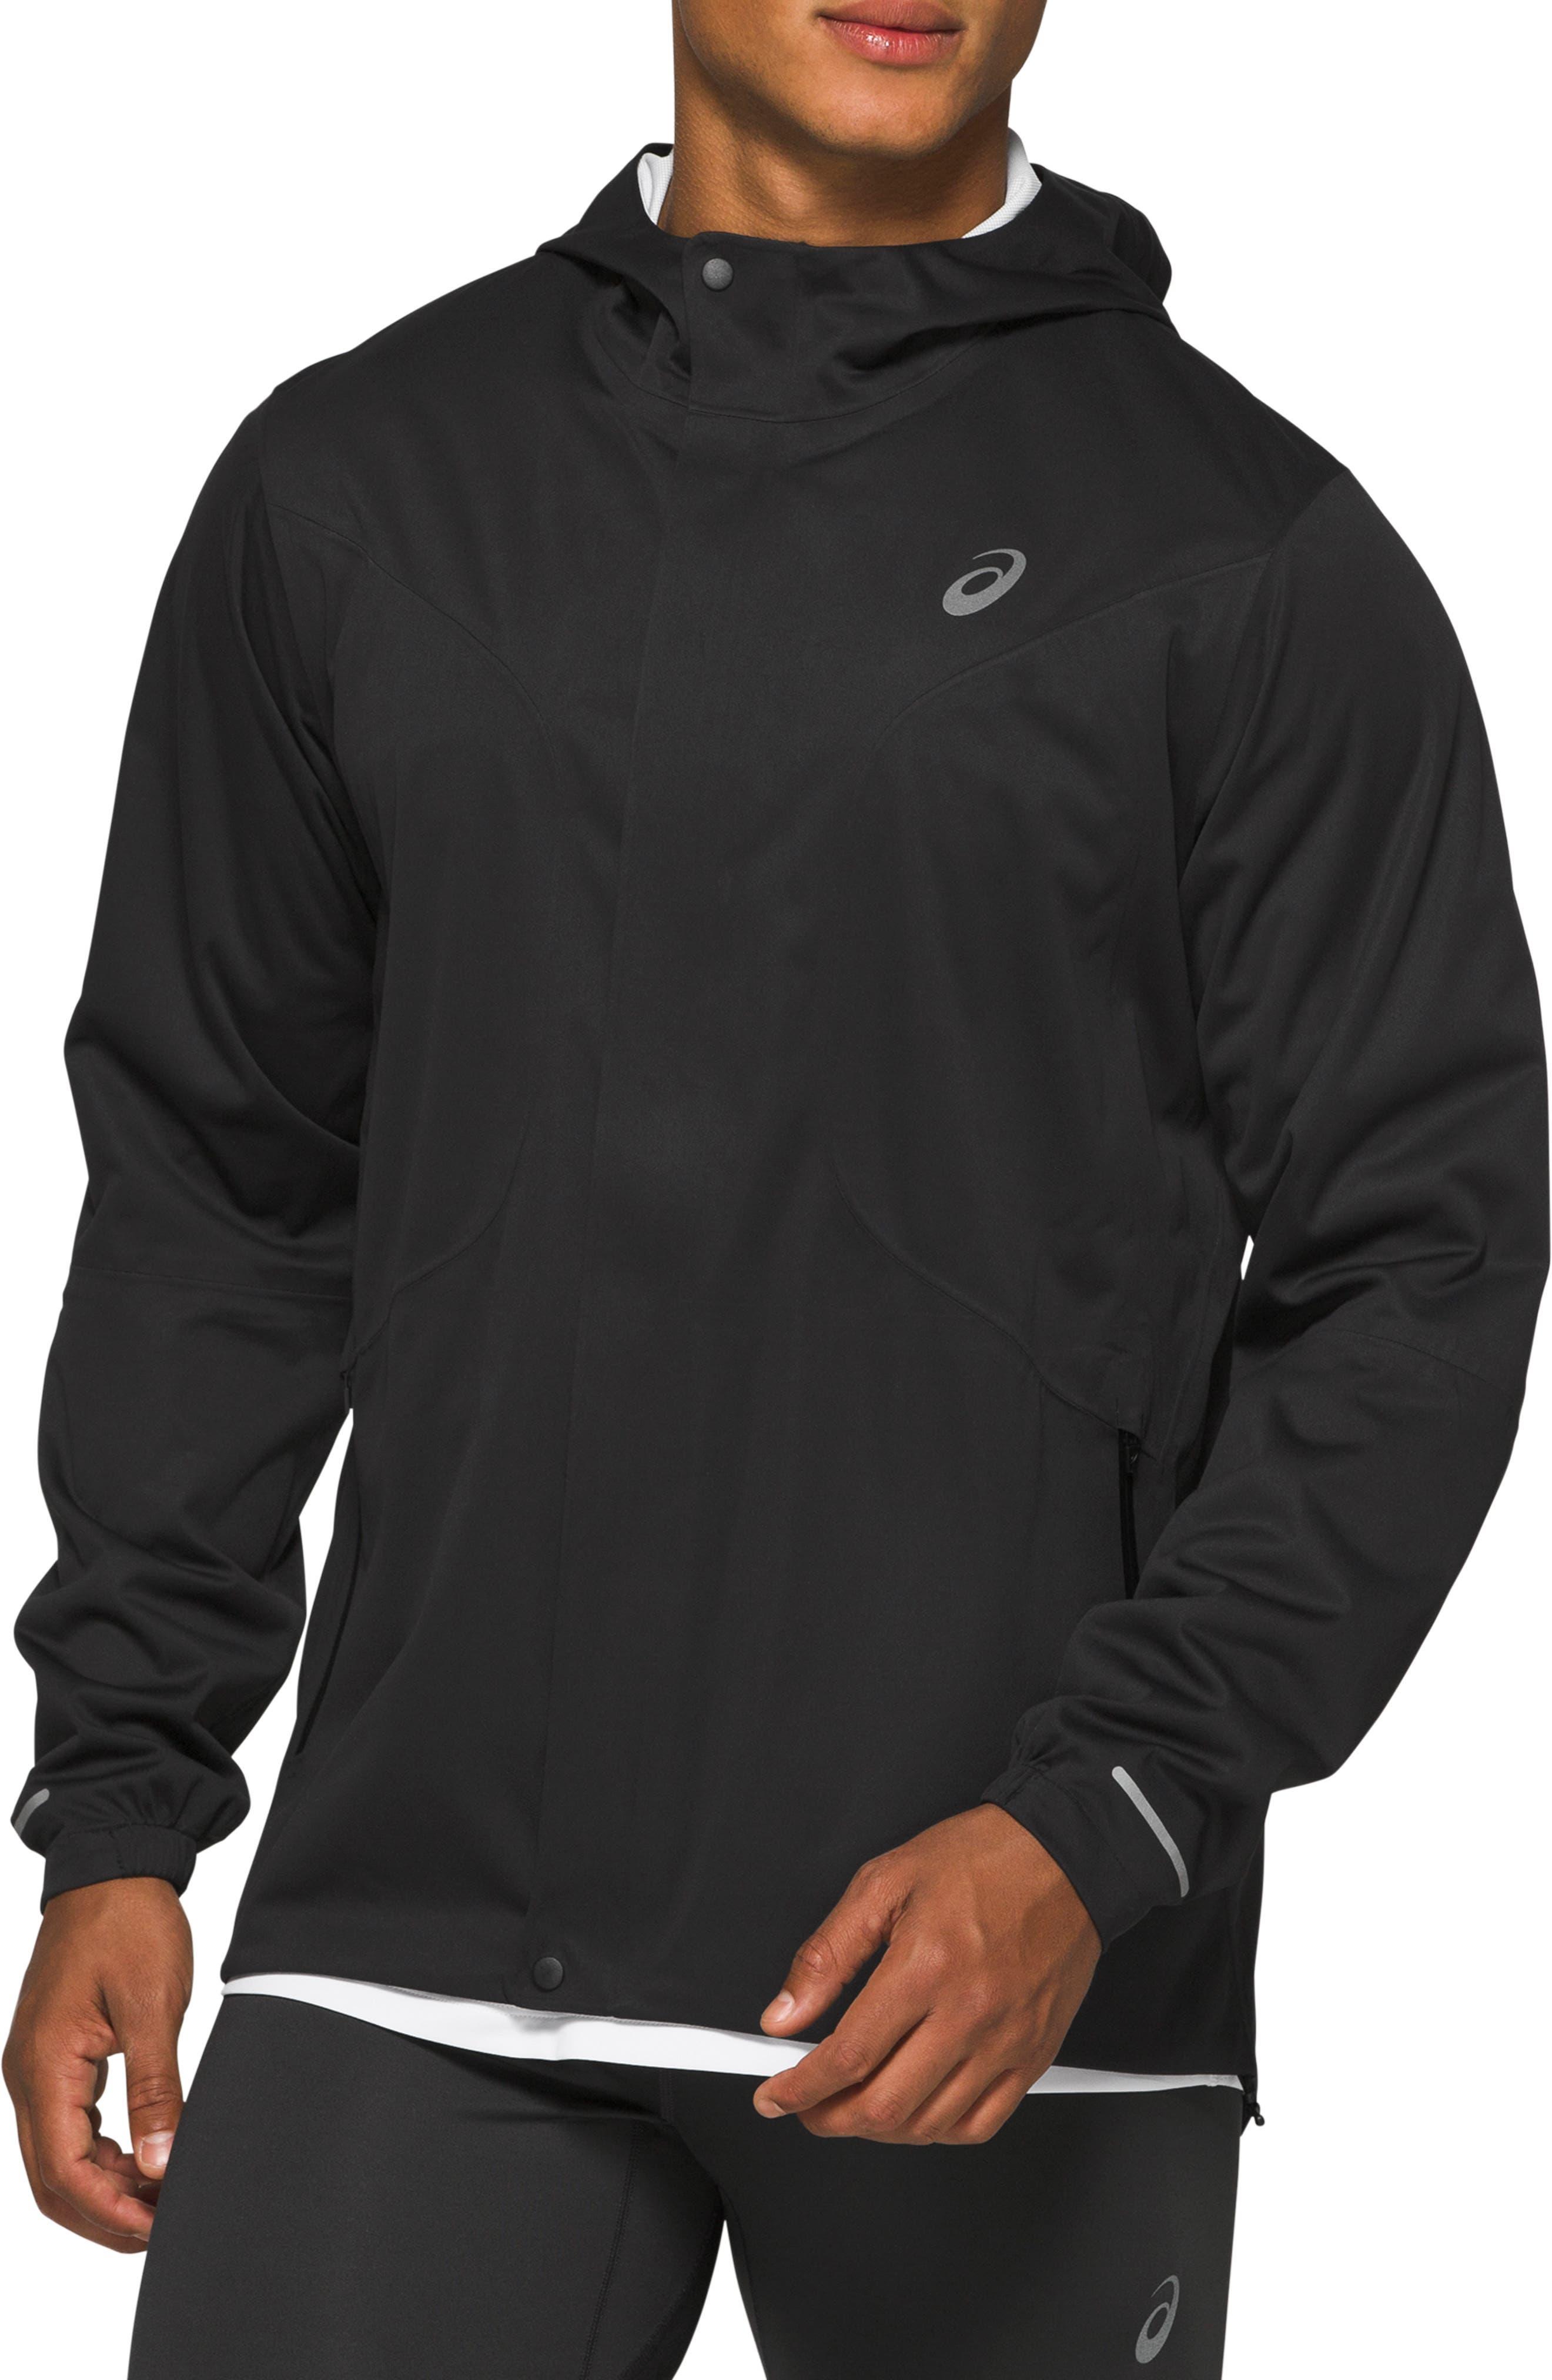 Men's Asics Accelerate Waterproof Hooded Jacket